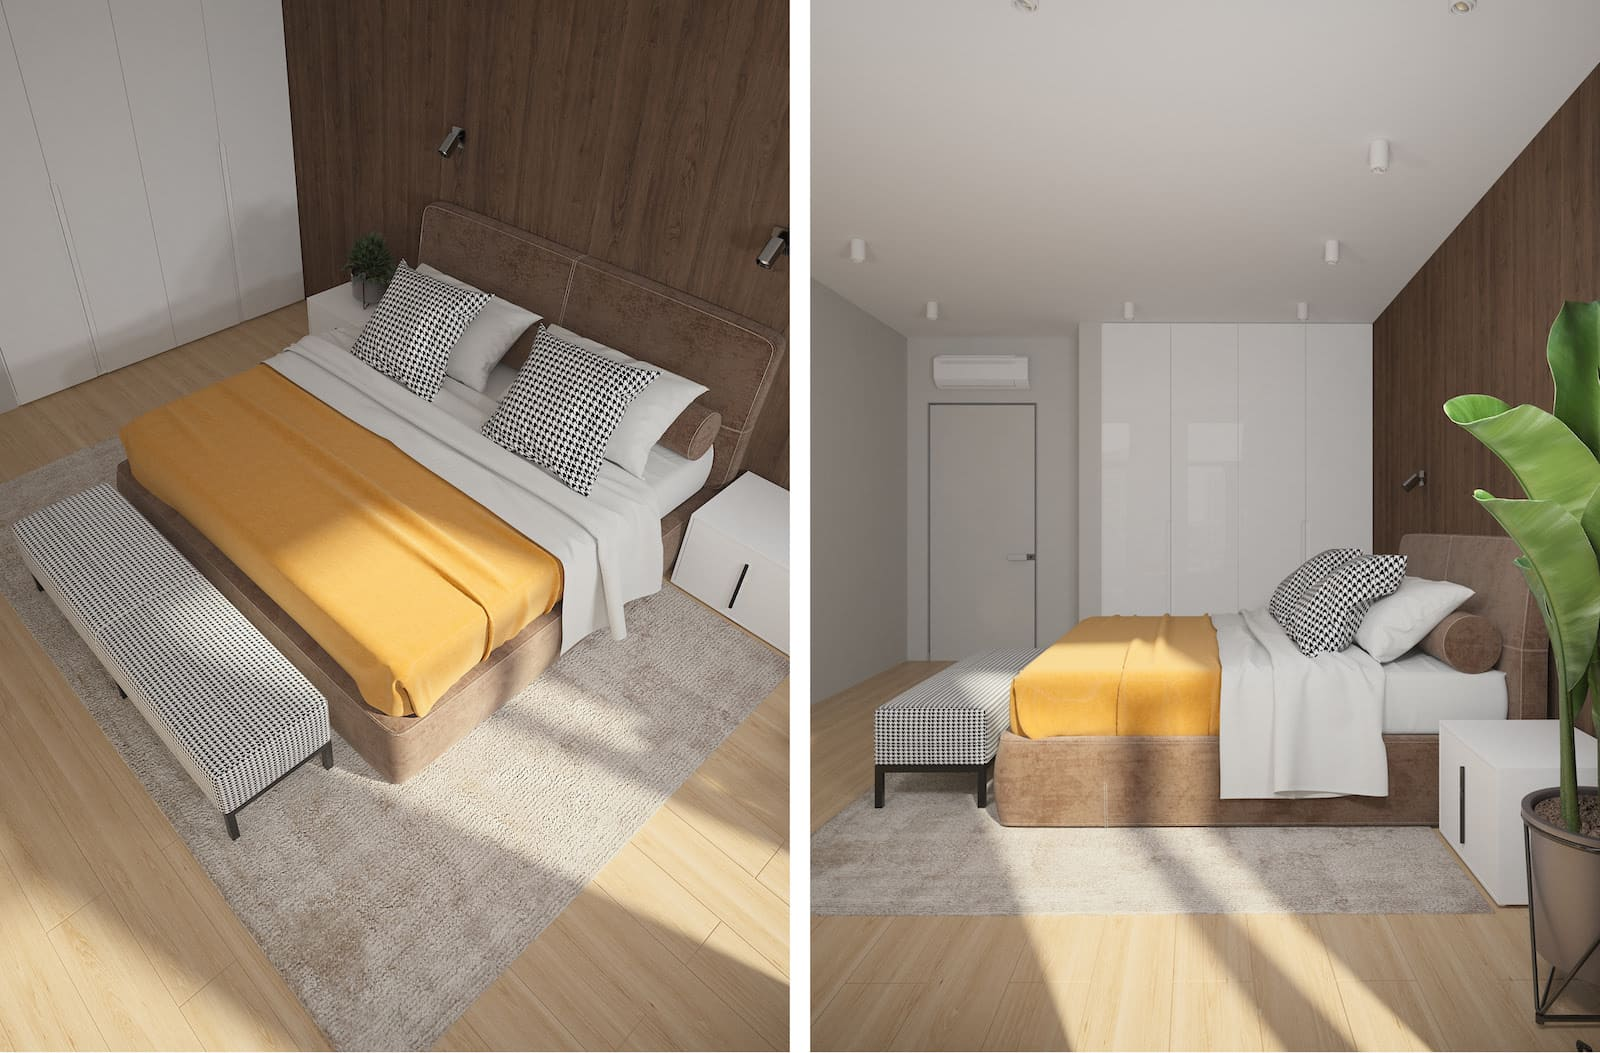 дизайн однокомнатной квартиры фото 11